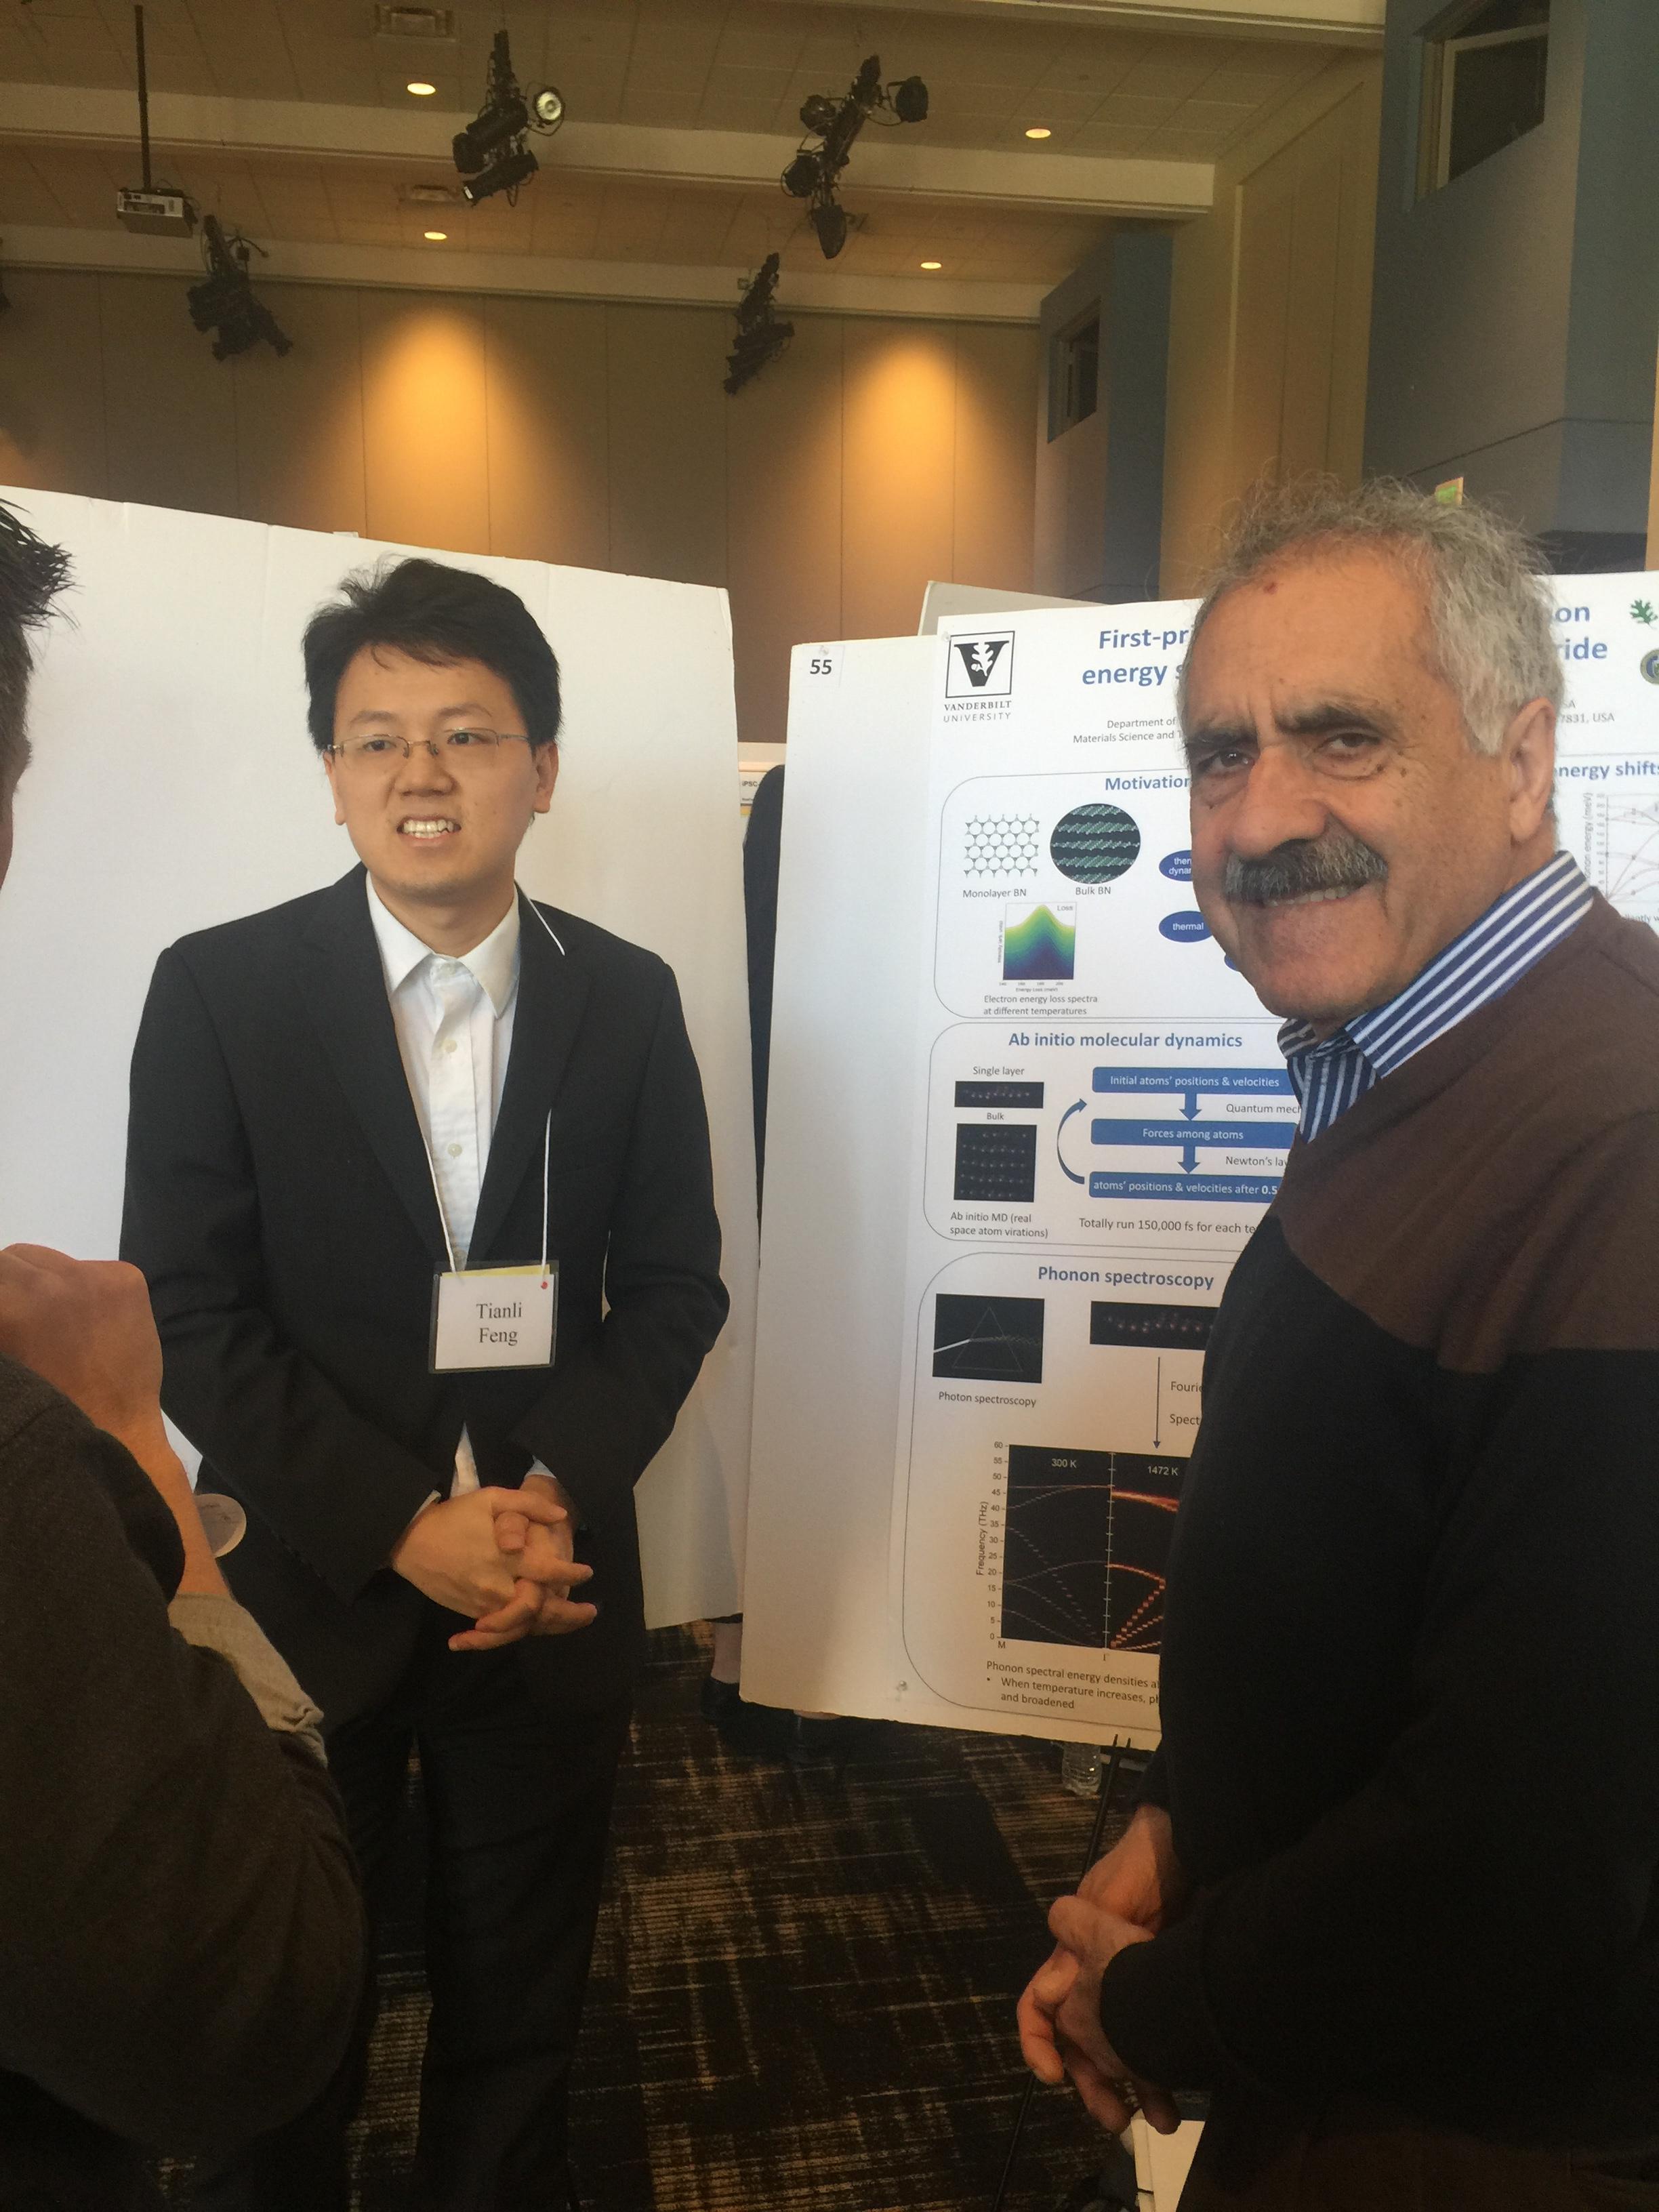 Vanderbilt Postdoctoral Affairs 2018 Symposium: Tianli Feng presenting his poster with Professor Pantelides.